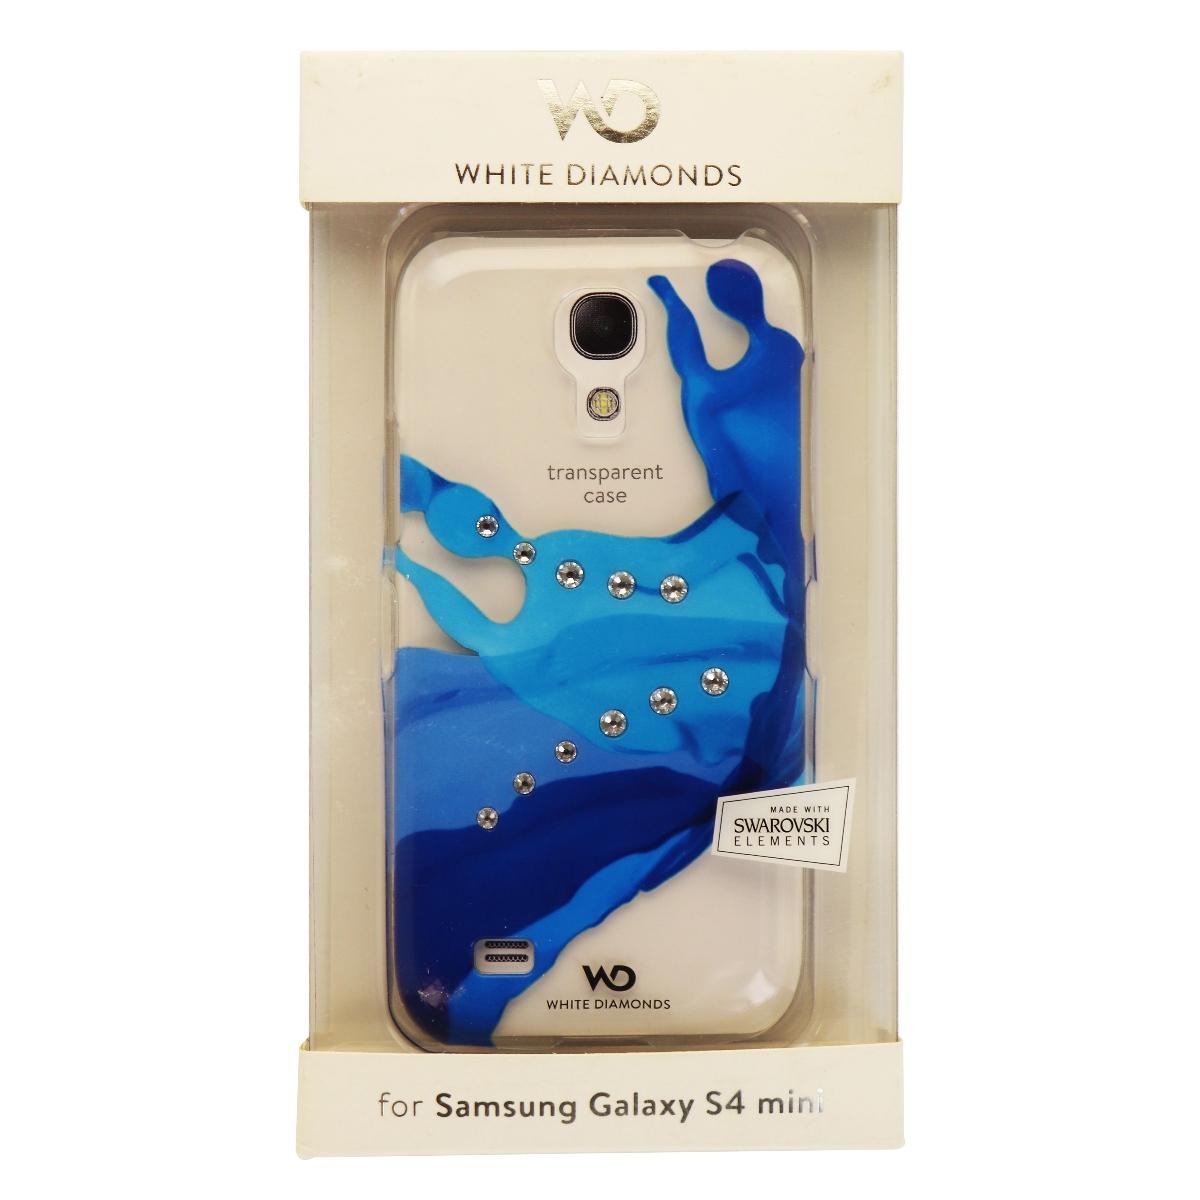 White Diamonds Transparent Case Cover for Galaxy S4 Mini - Blue Diamond Clear